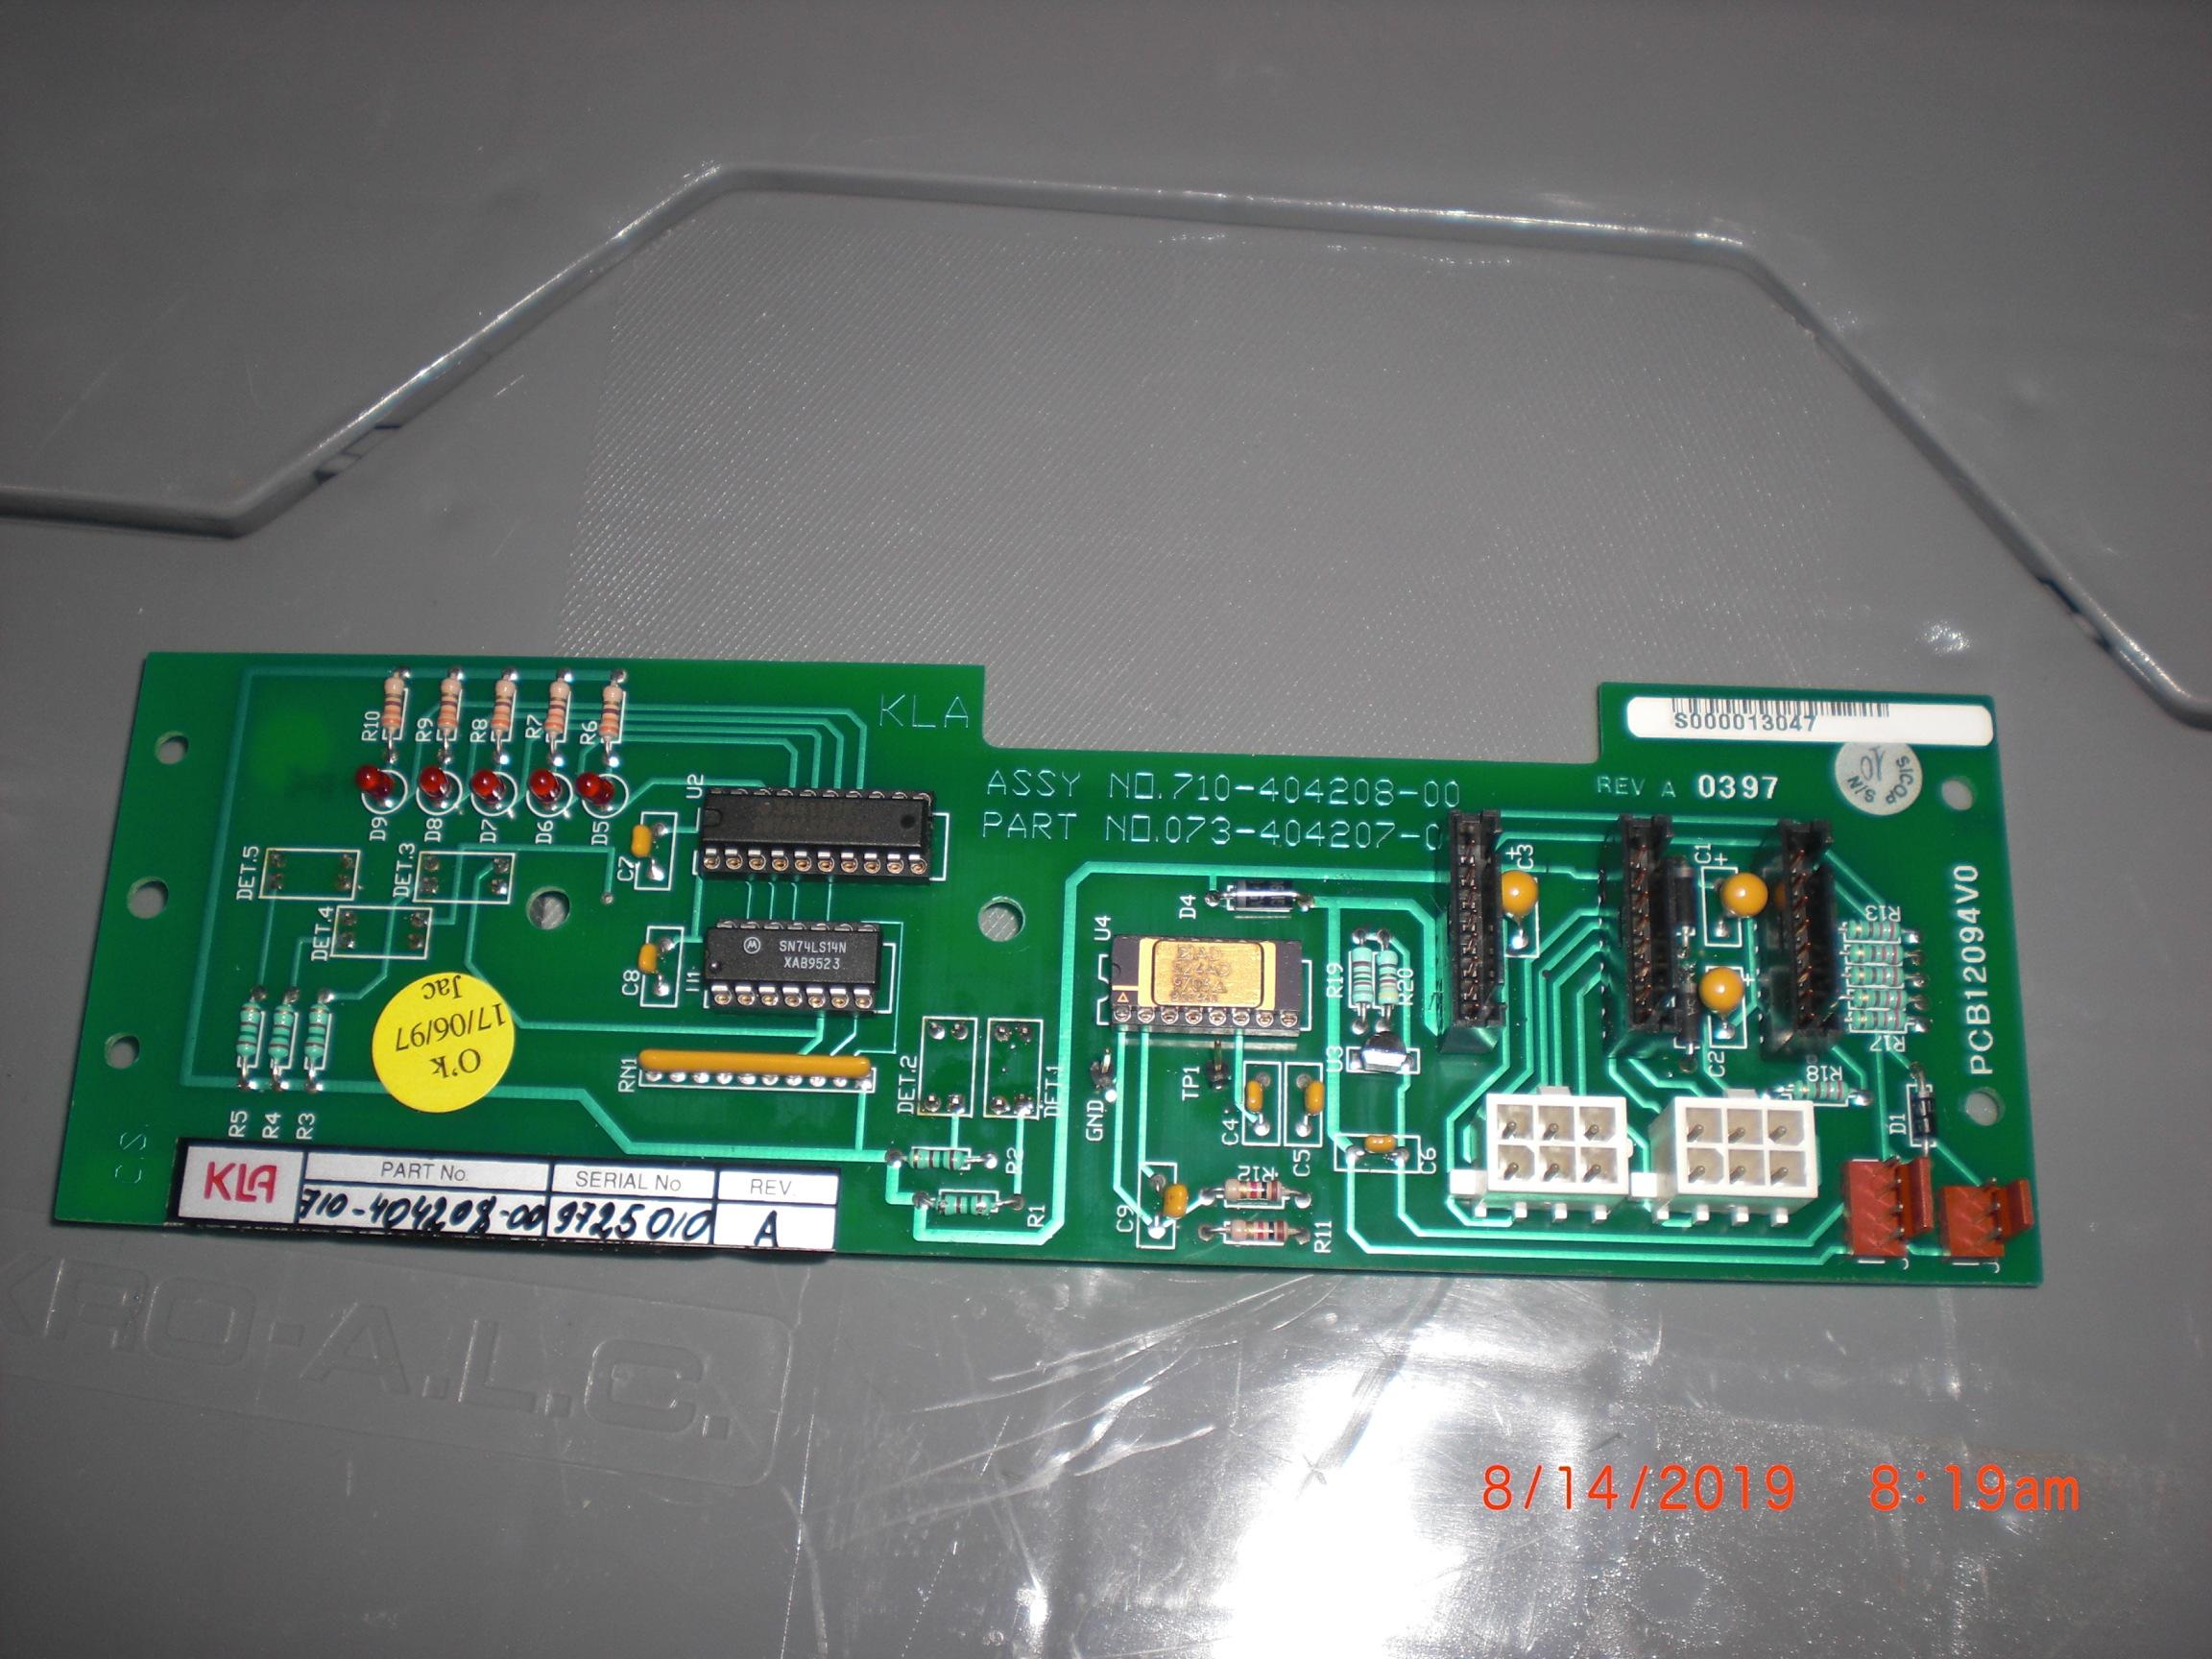 PCB KLA / TENCOR 710-404208-00 Overlay Arm INTERCONNECT  5200